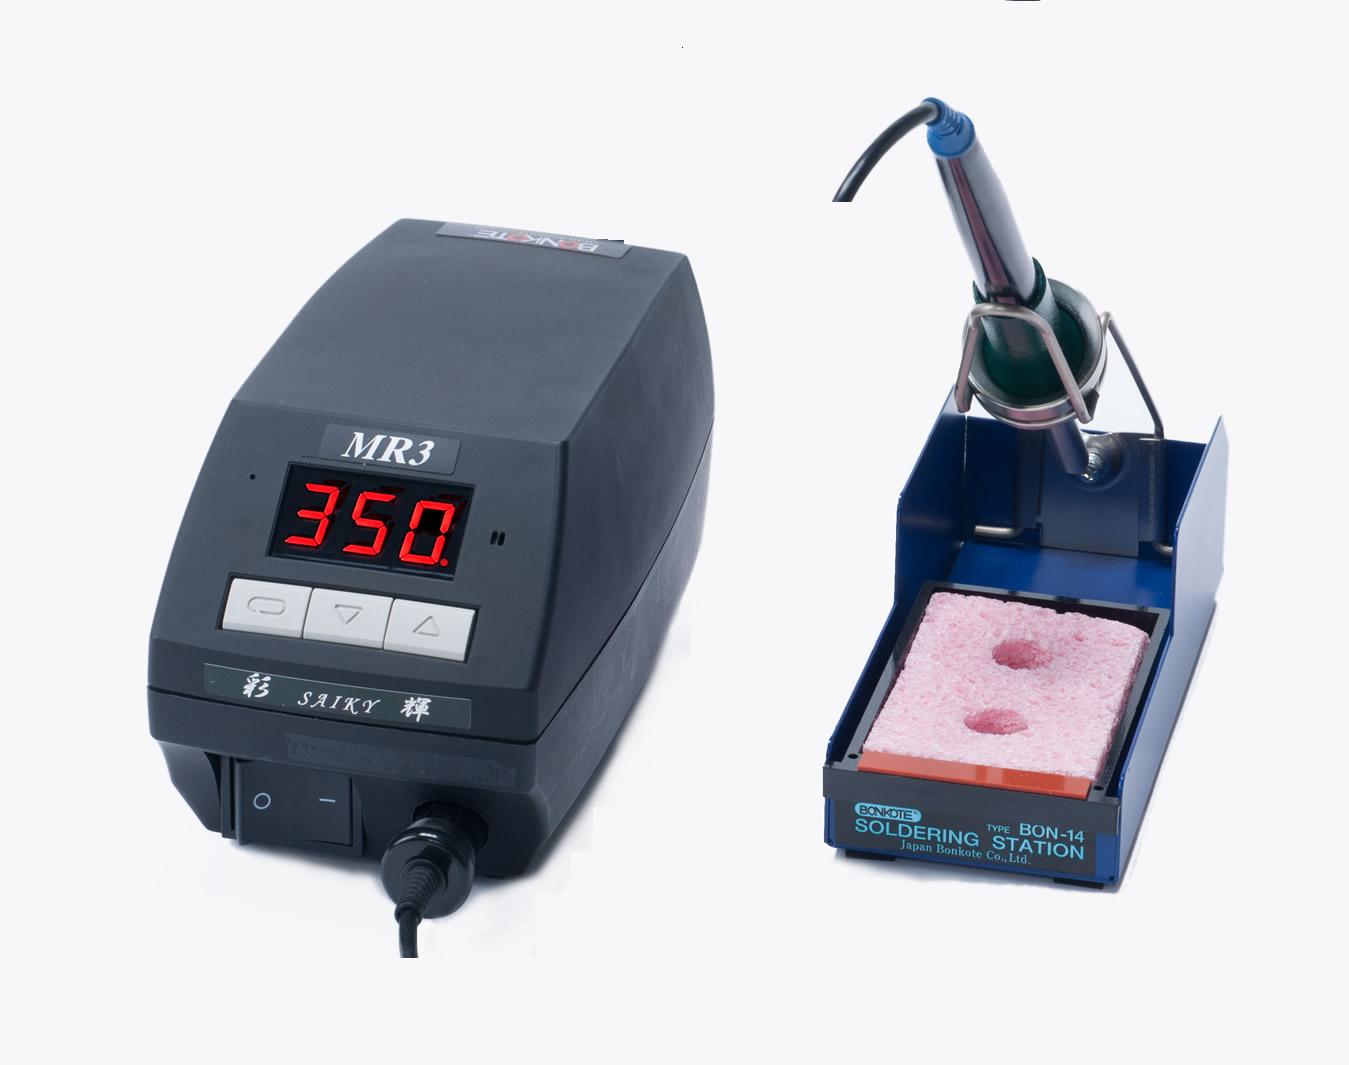 MR4 SAIKY soldering iron station